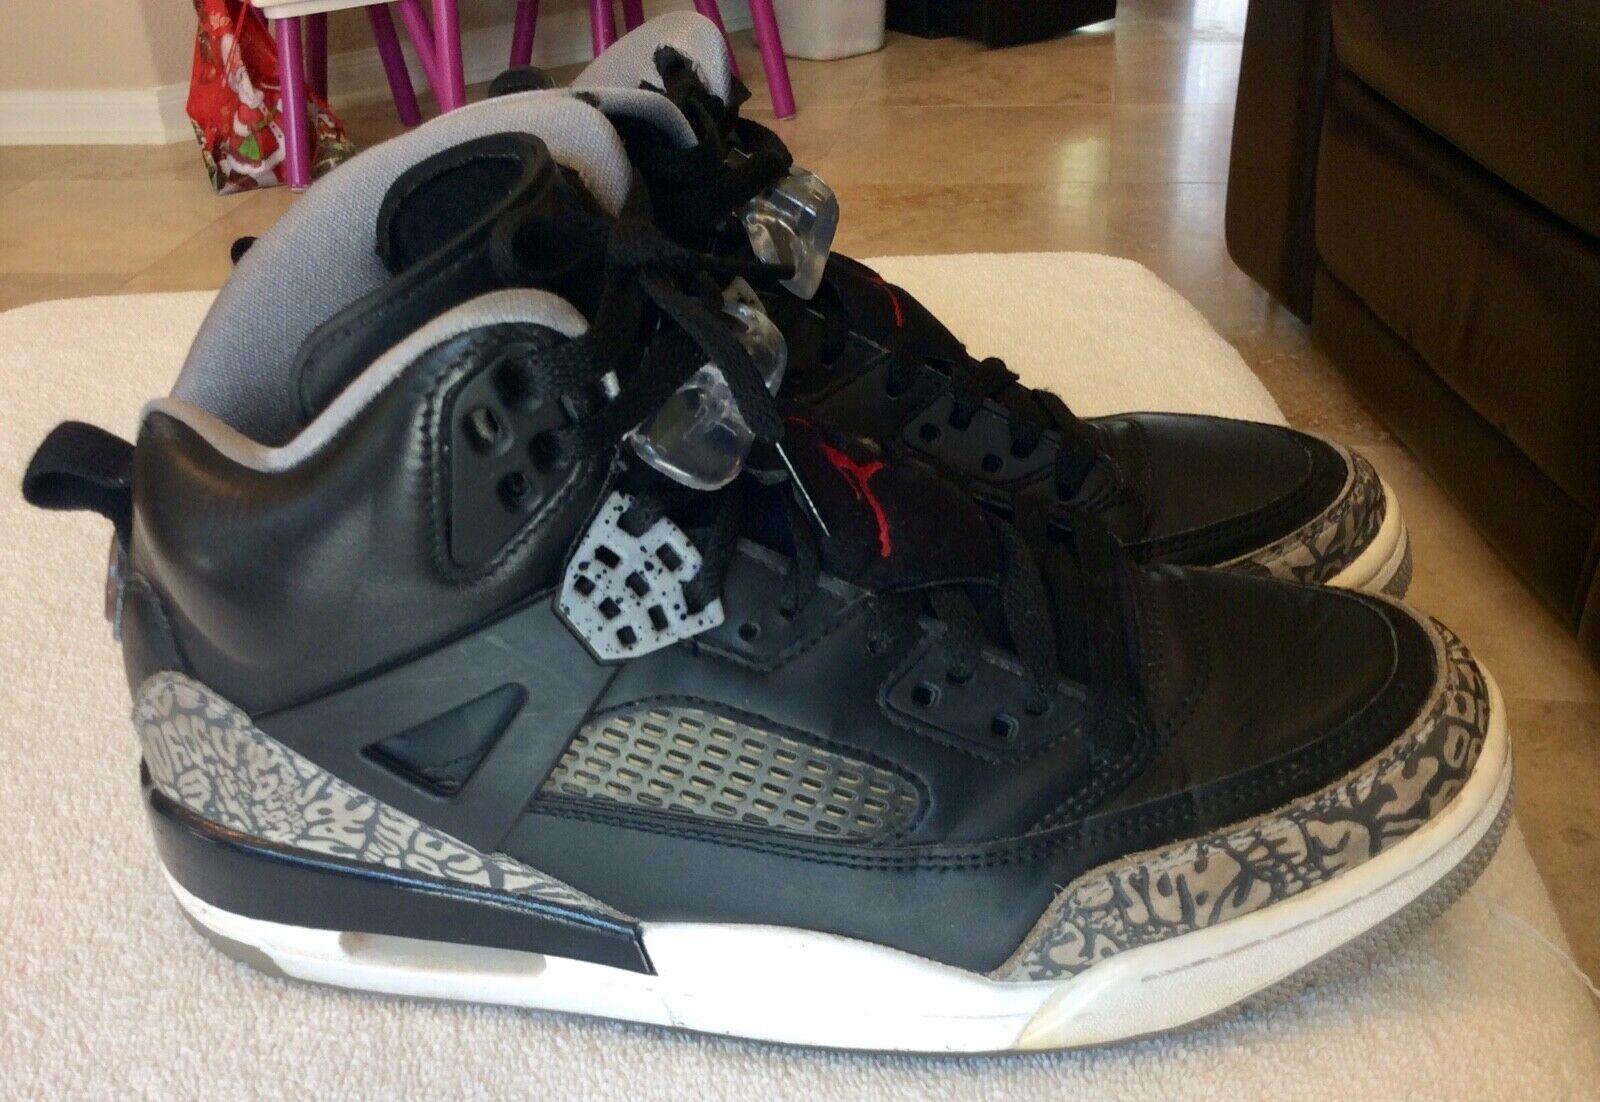 Nike Air Jordan Spizike Varsity size 8.5 & Box